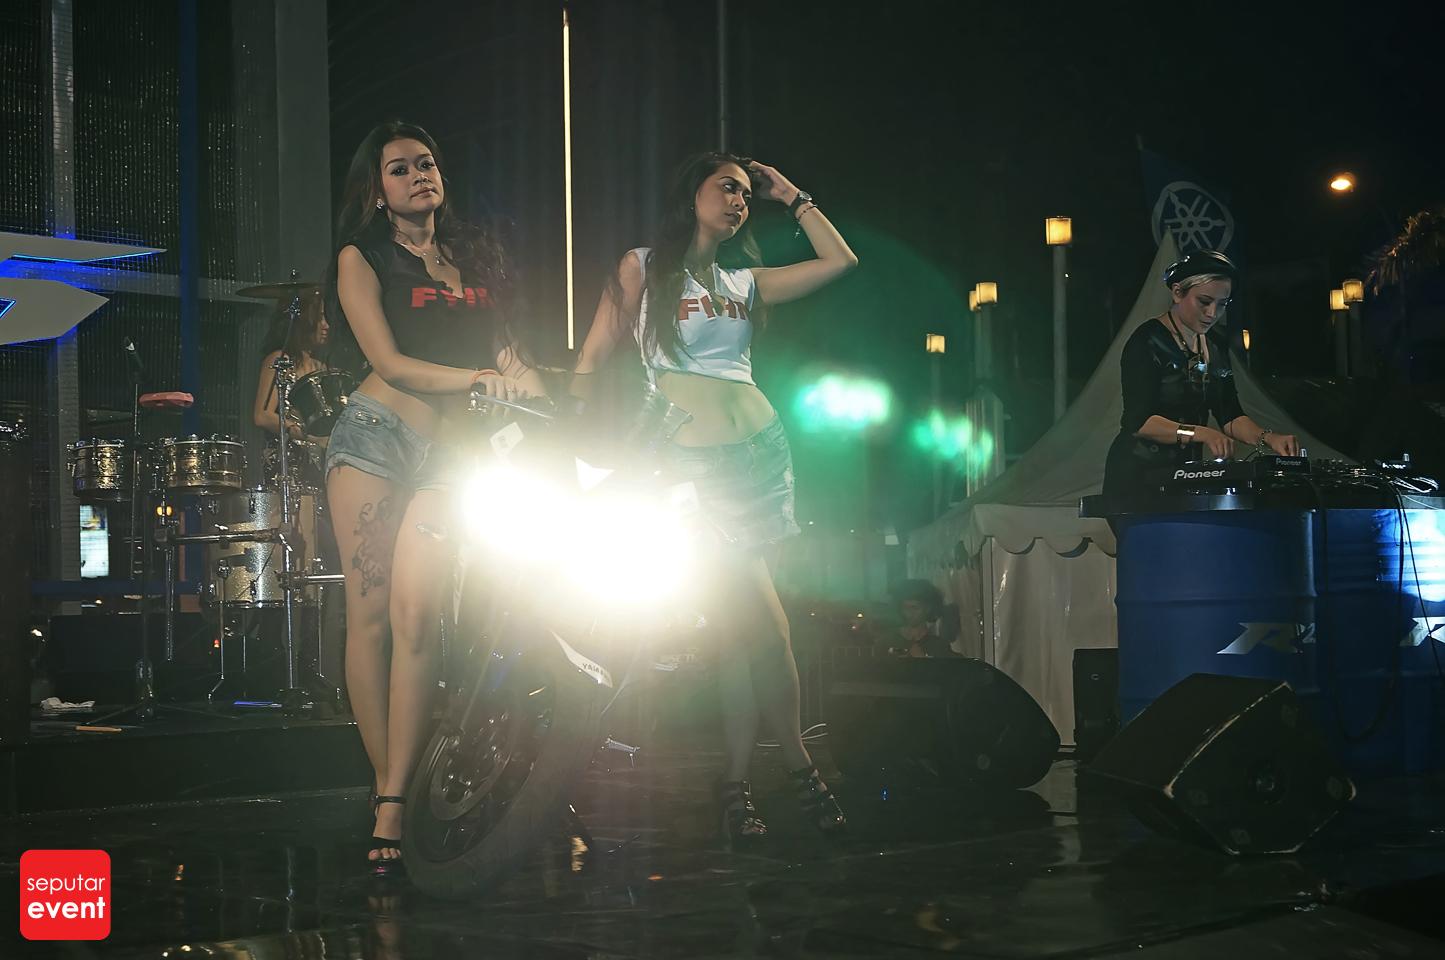 yamaha-revs-party-2014-seputarevent (22).JPG